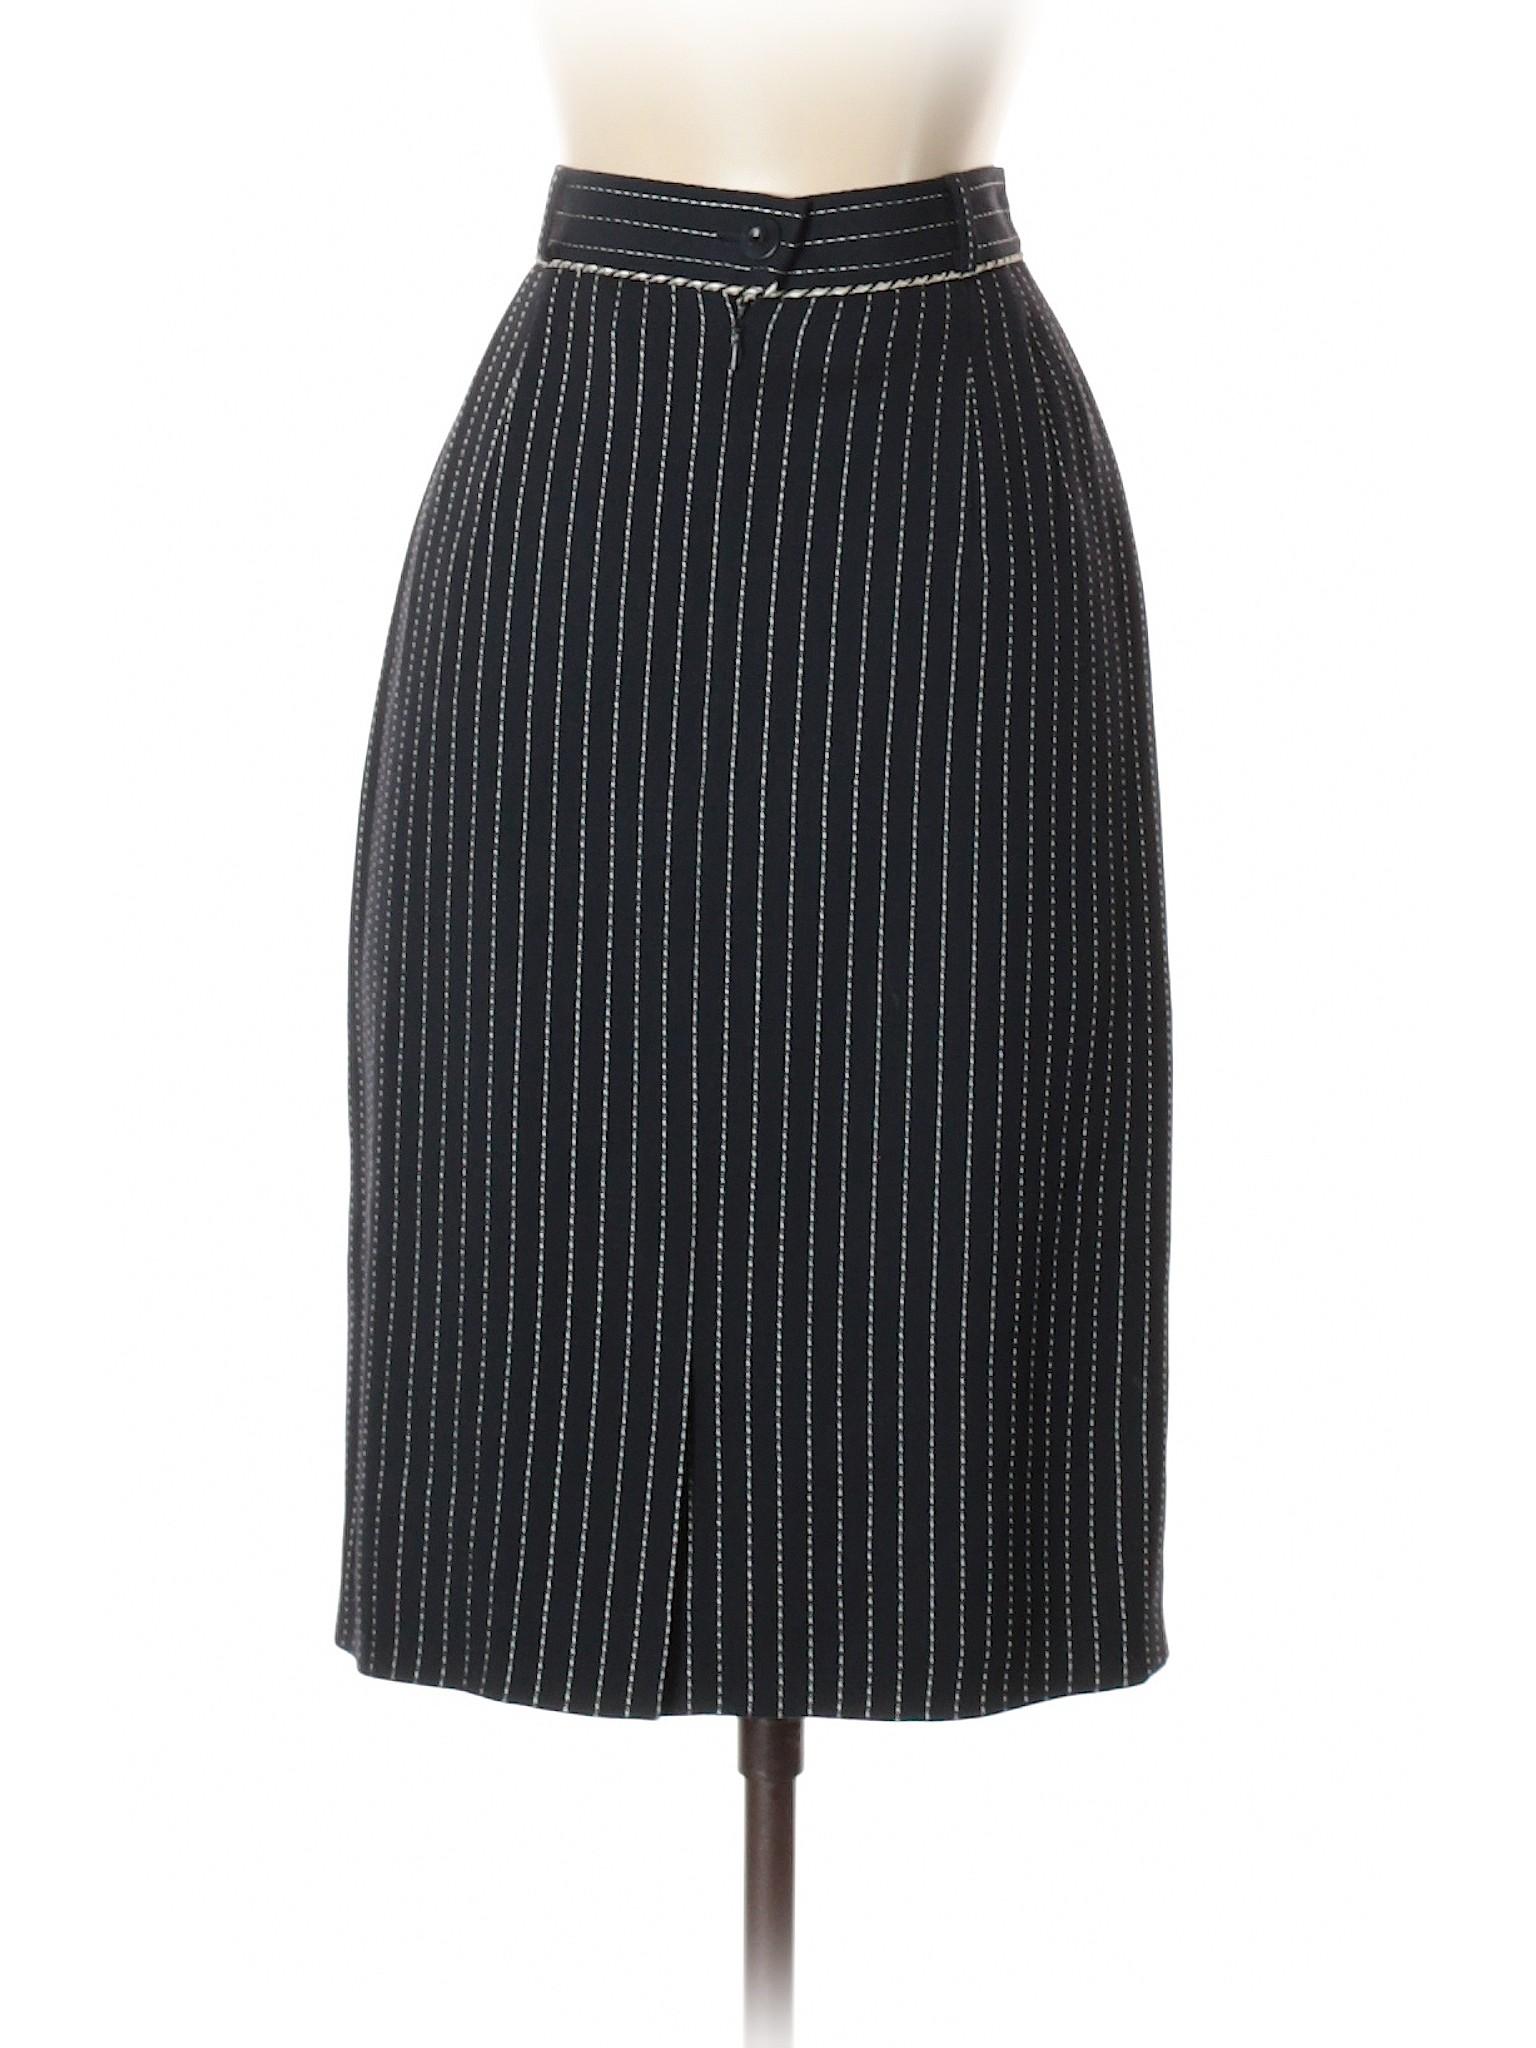 Boutique Skirt Boutique Casual Skirt Boutique Skirt Casual Boutique Casual zqBwAqHP